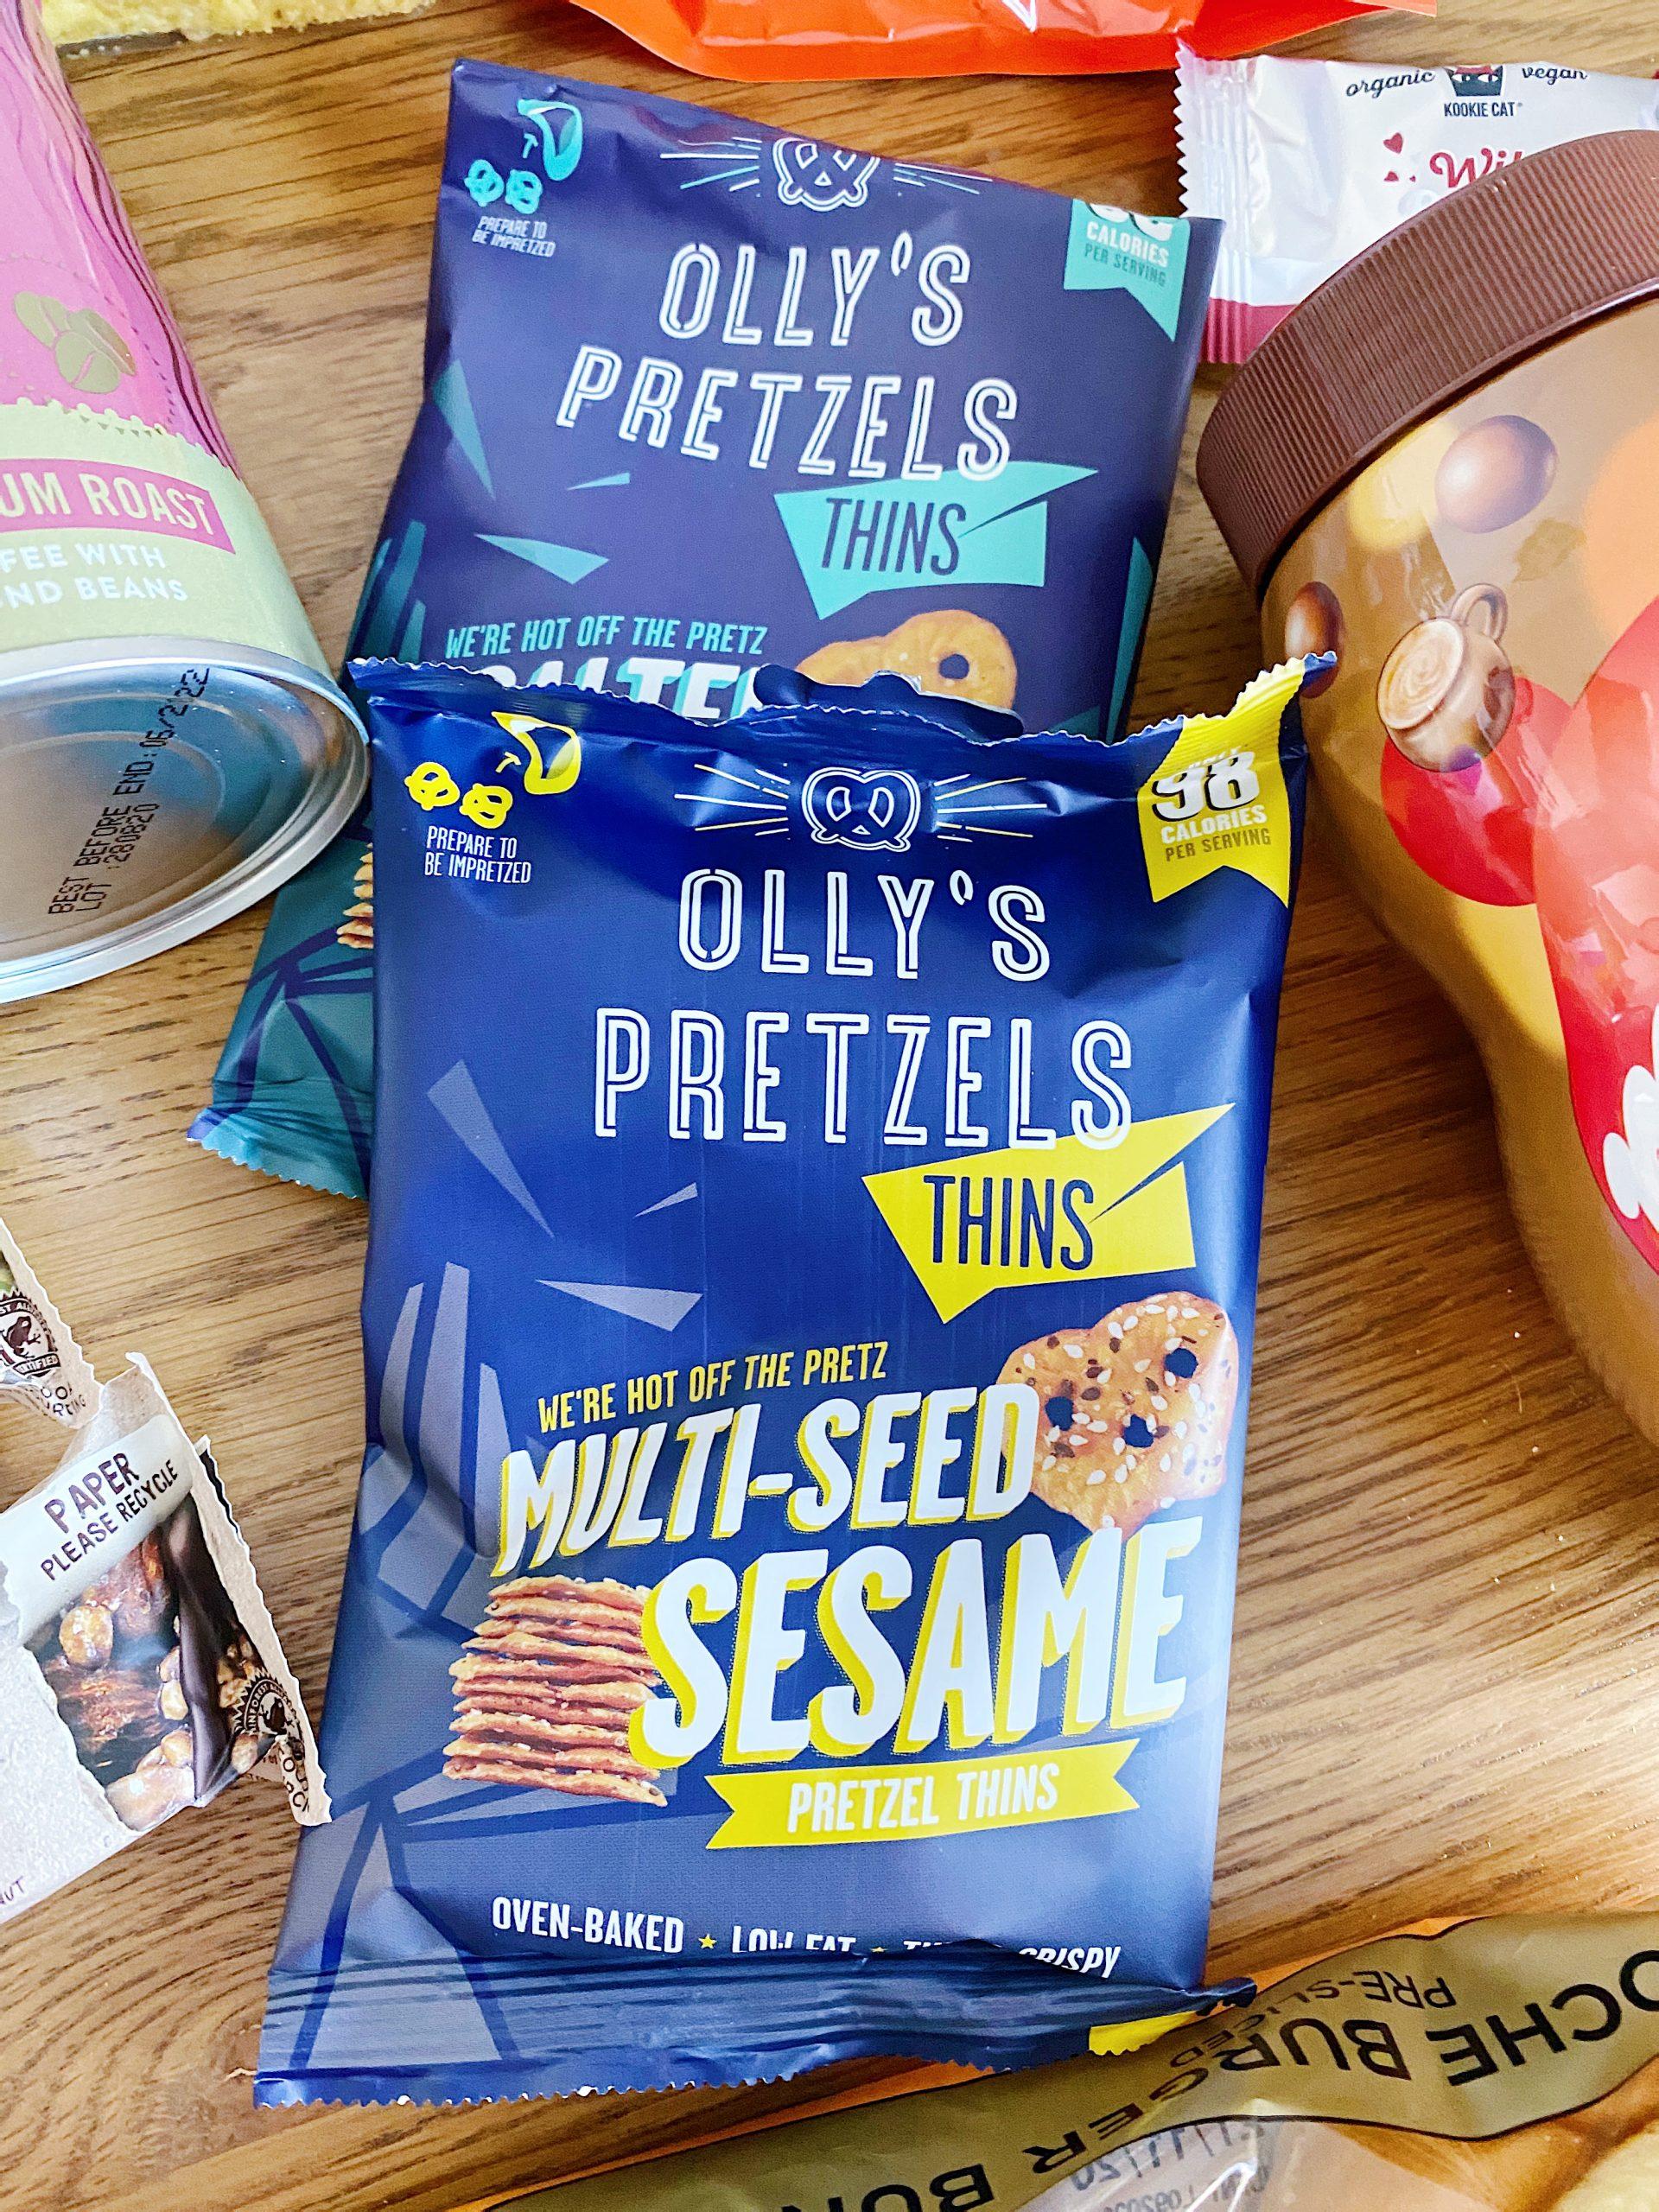 Degustabox October olly's pretzels